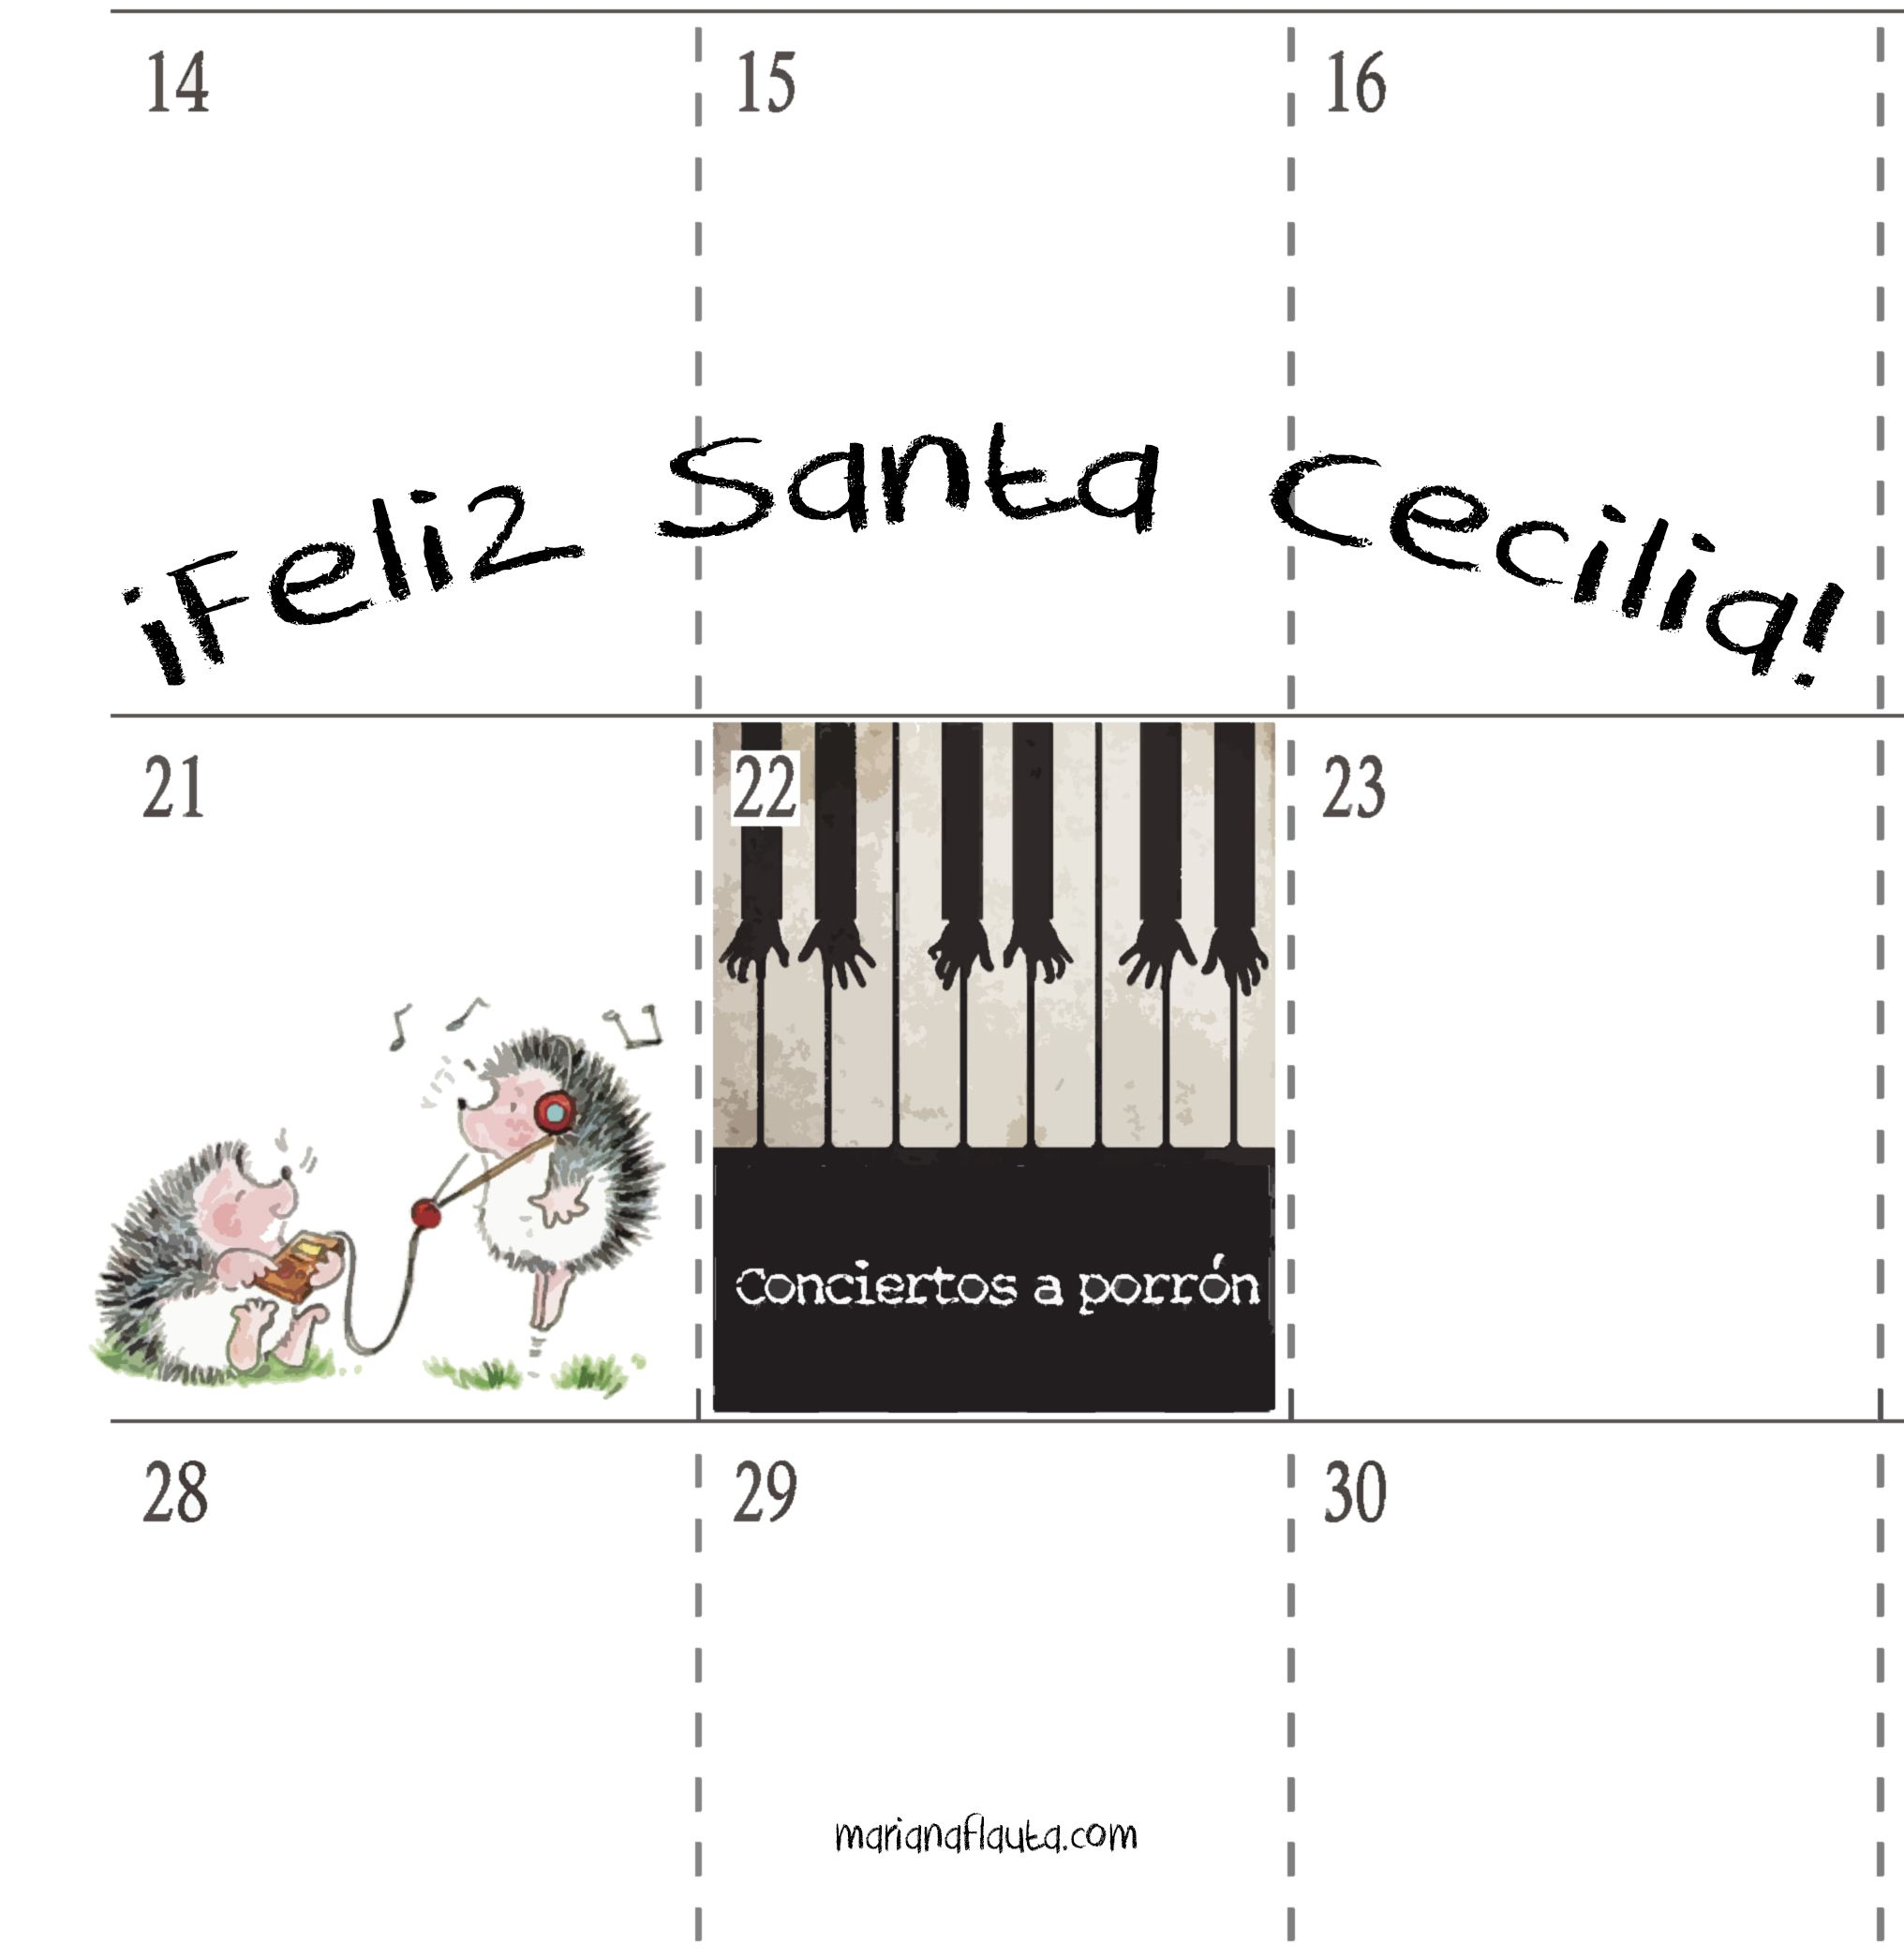 Feliz Santa Cecilia Flute MusicBlog Flauta Marianaflauta